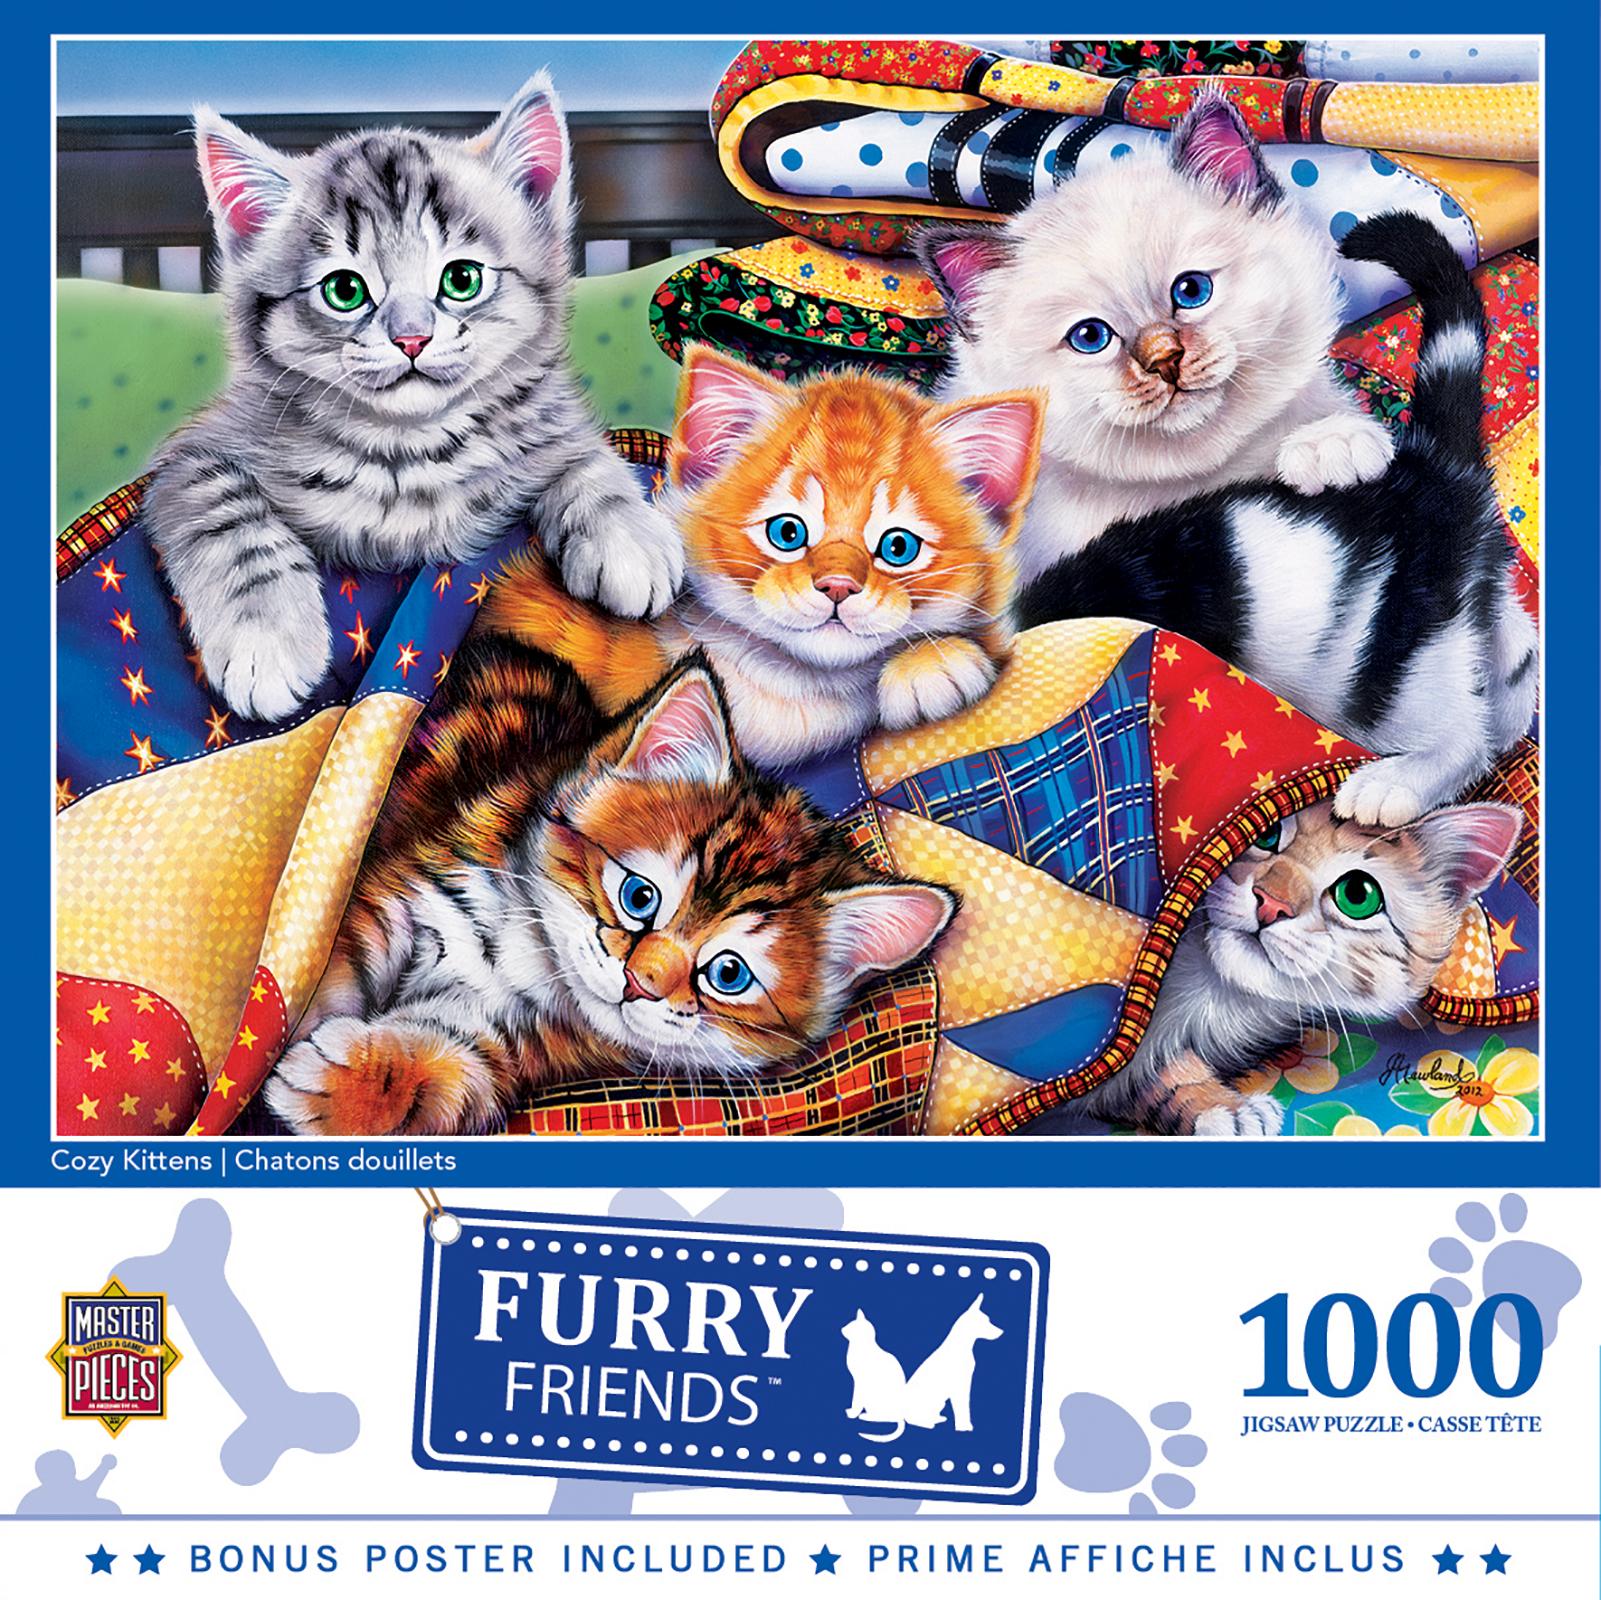 Cozy Kittens Animals Jigsaw Puzzle